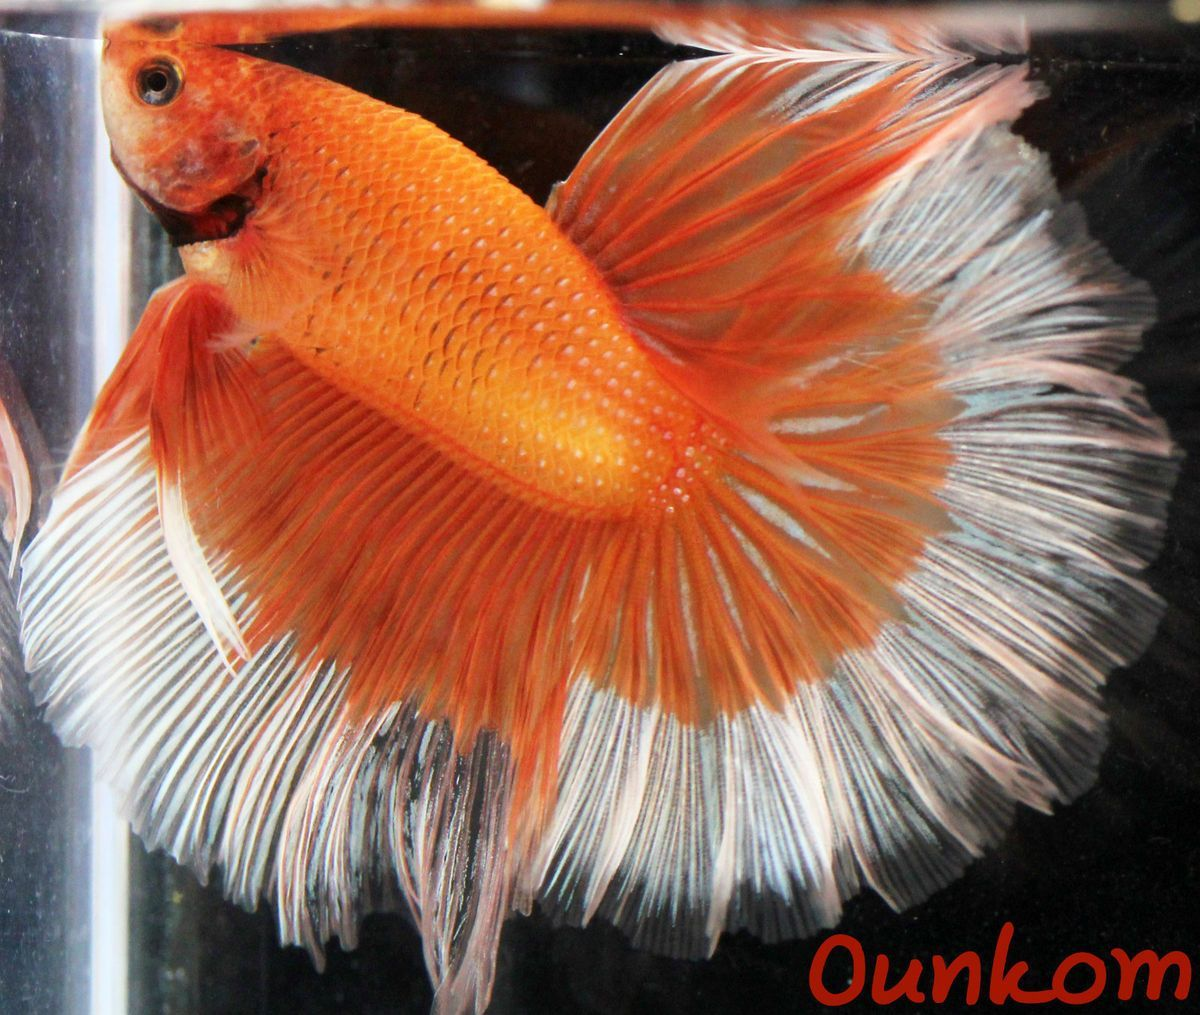 Orange white butterfly halfmoon male live betta fish for Keeping betta fish